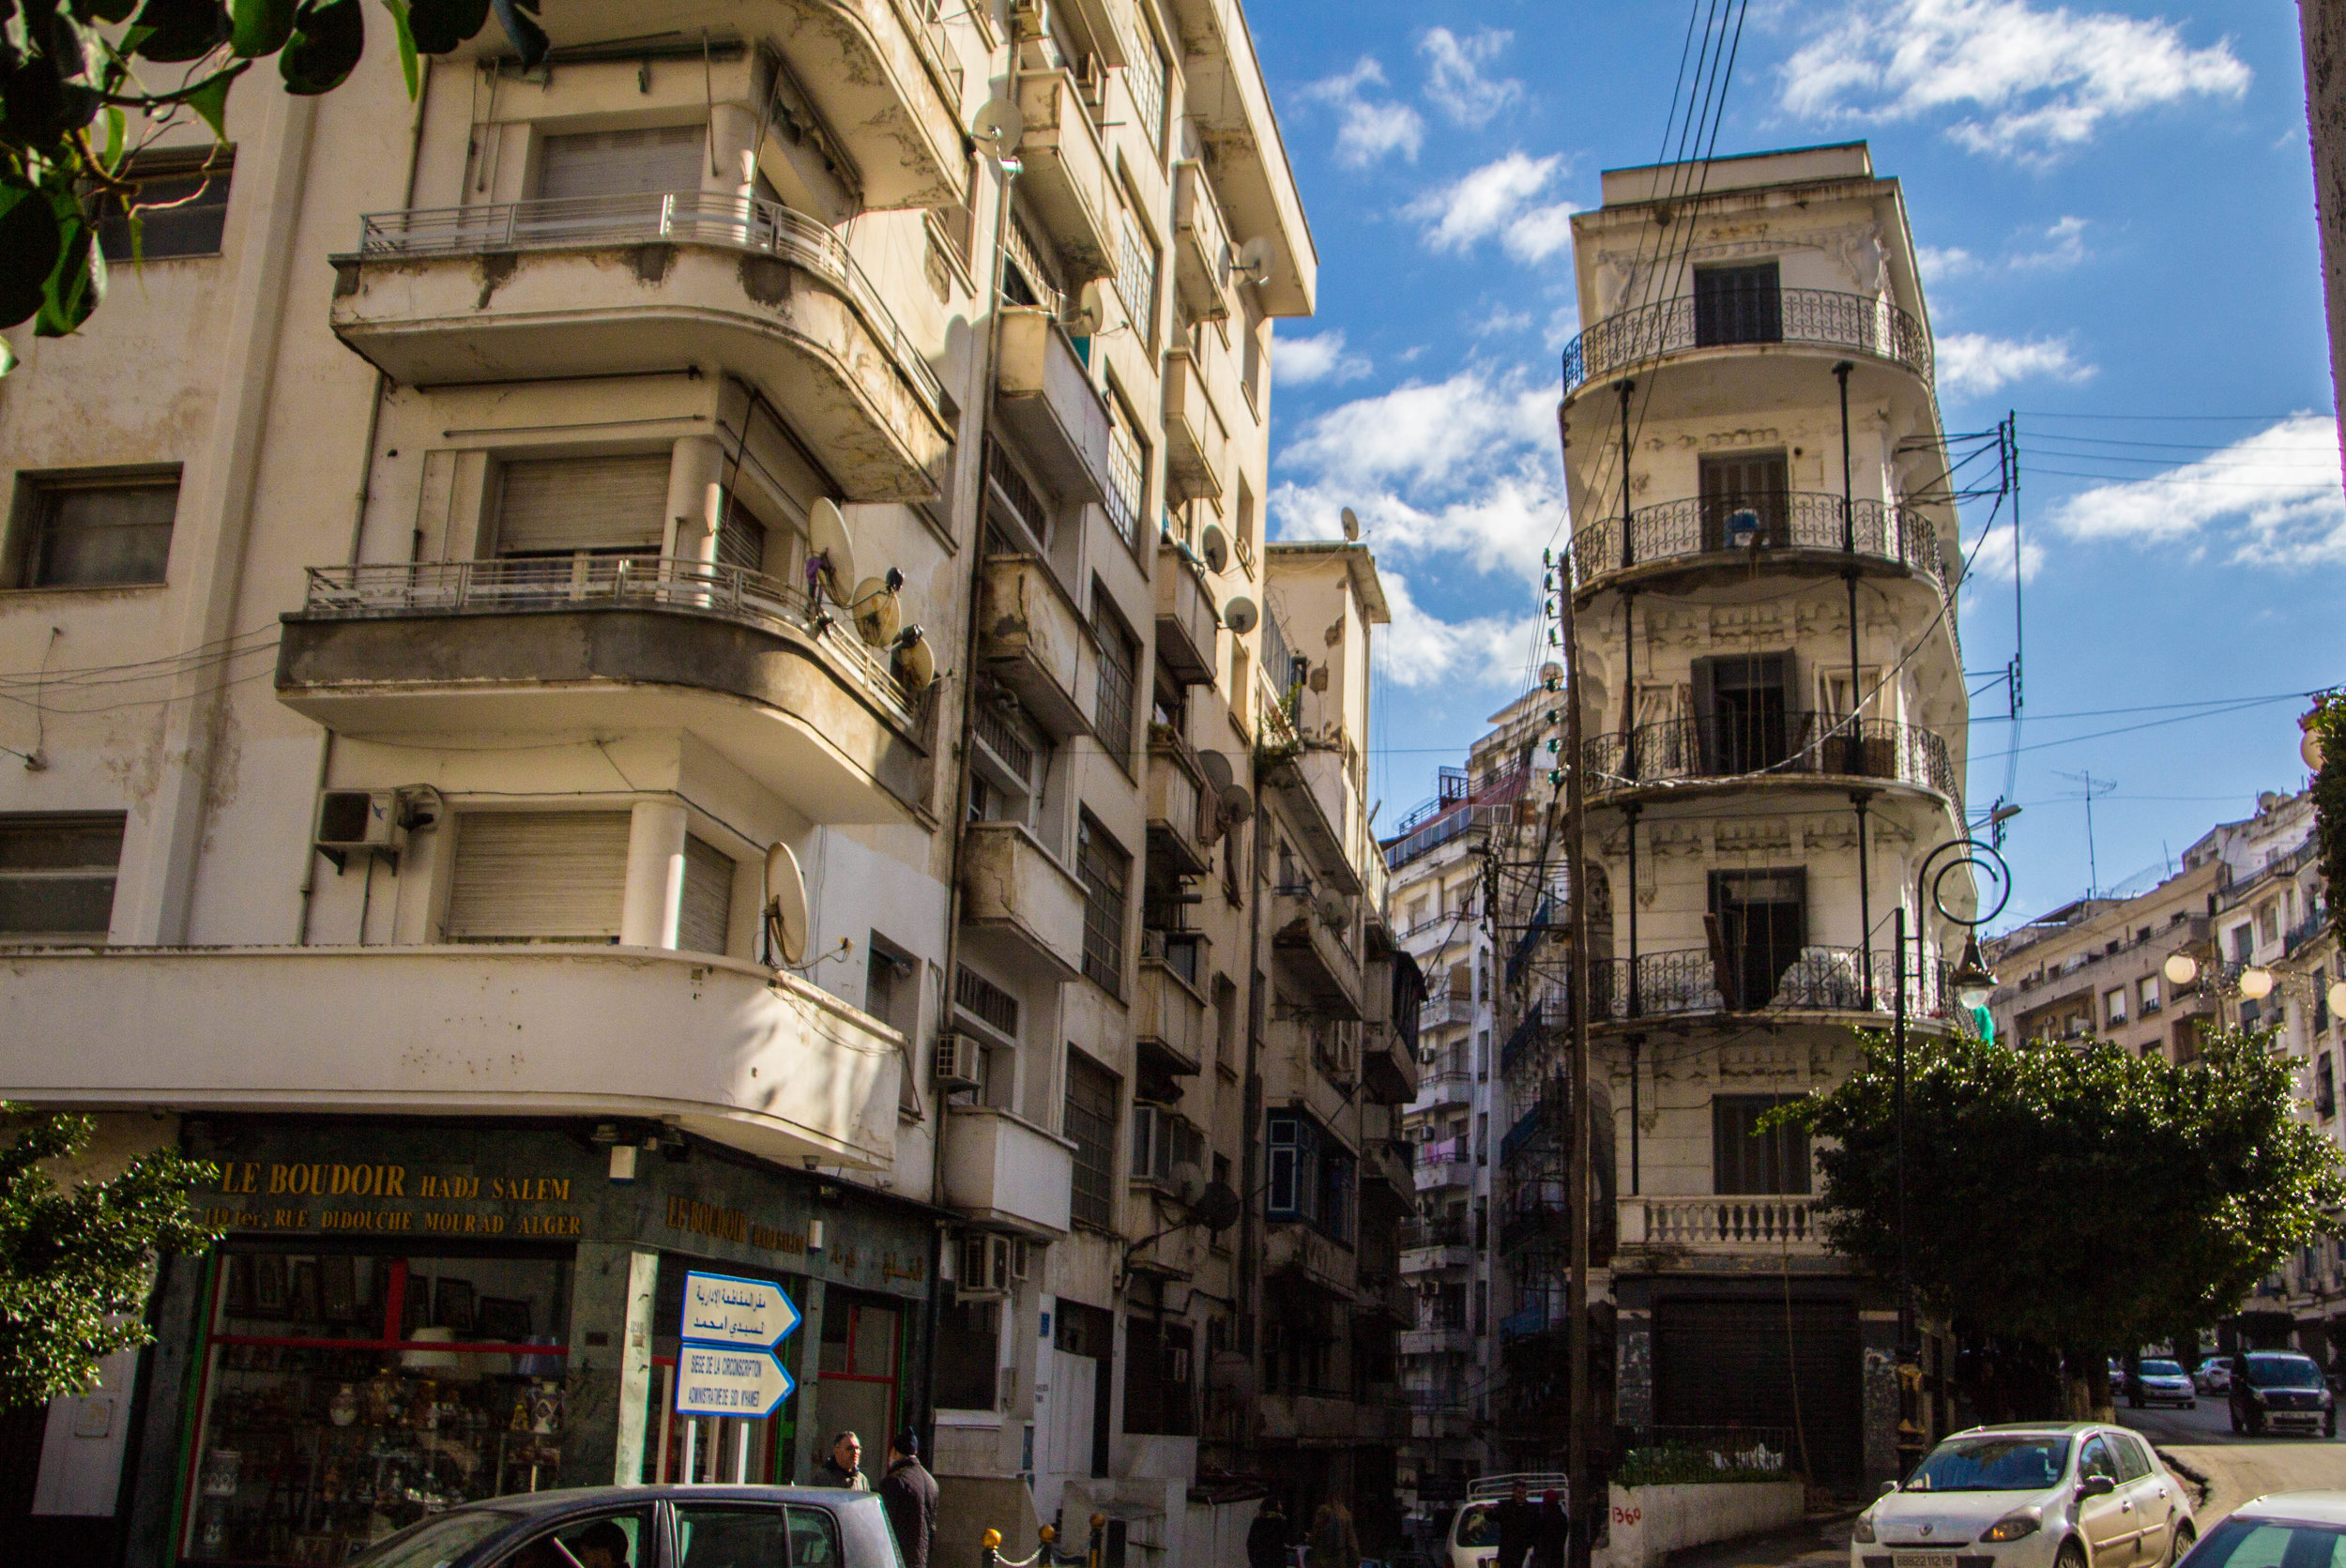 algiers-algieria-streets-3.jpg